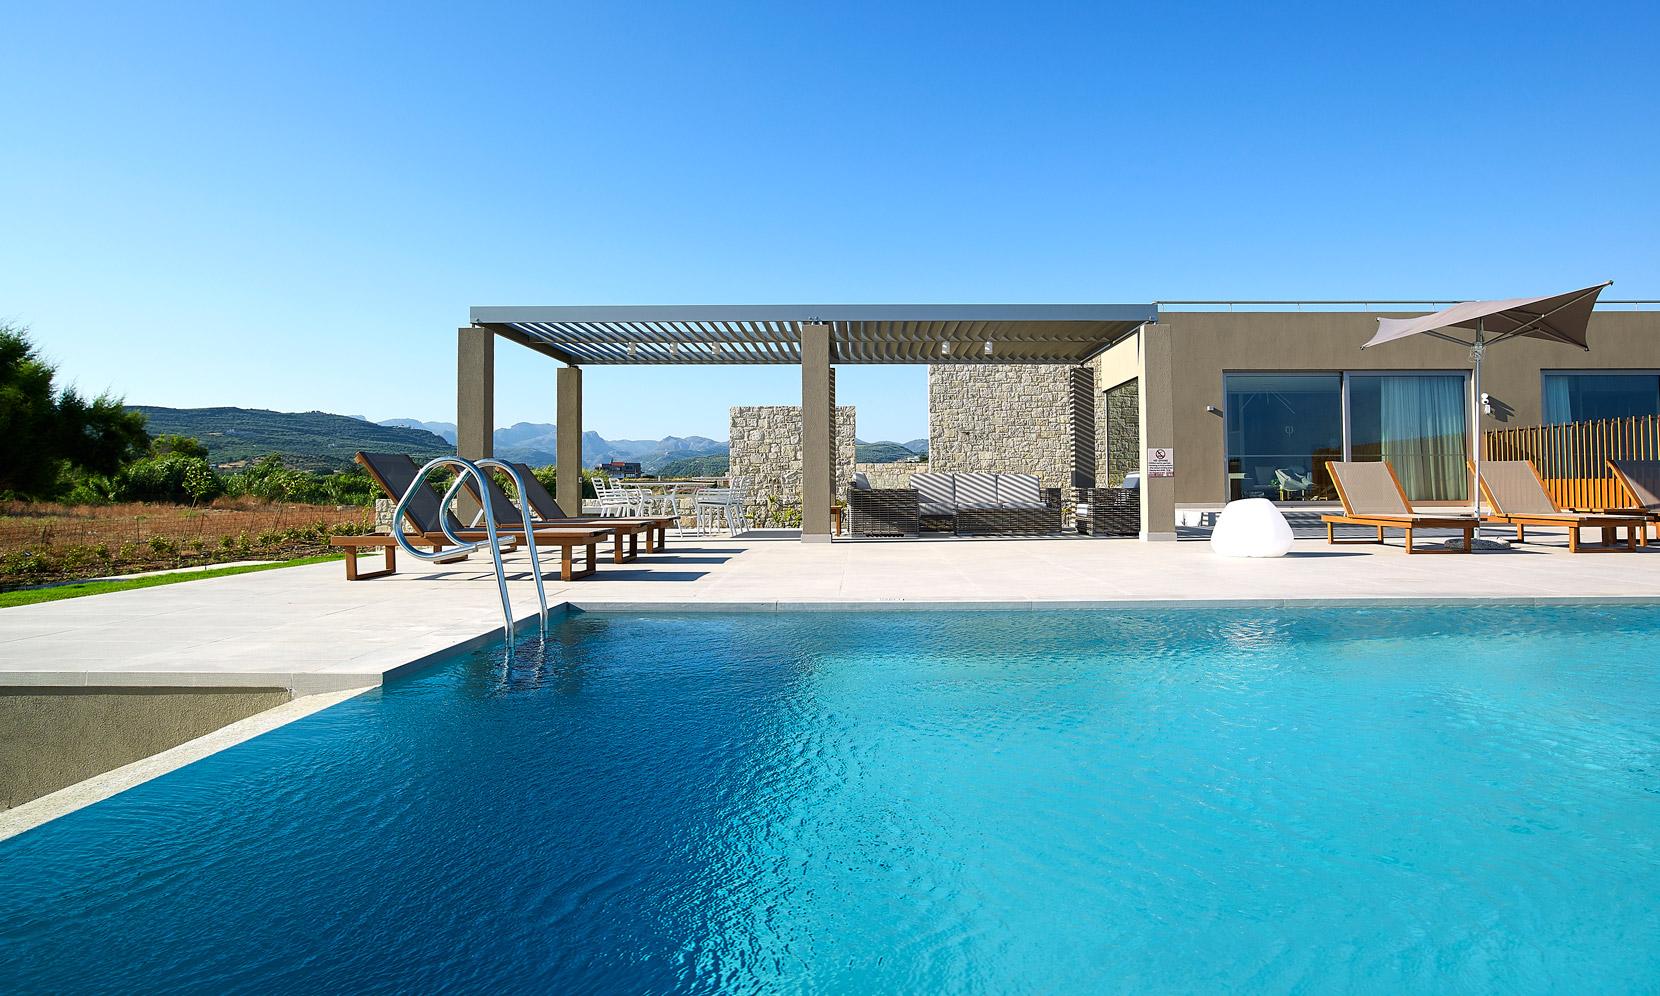 Crete Villa Acerol 2 jumbotron image